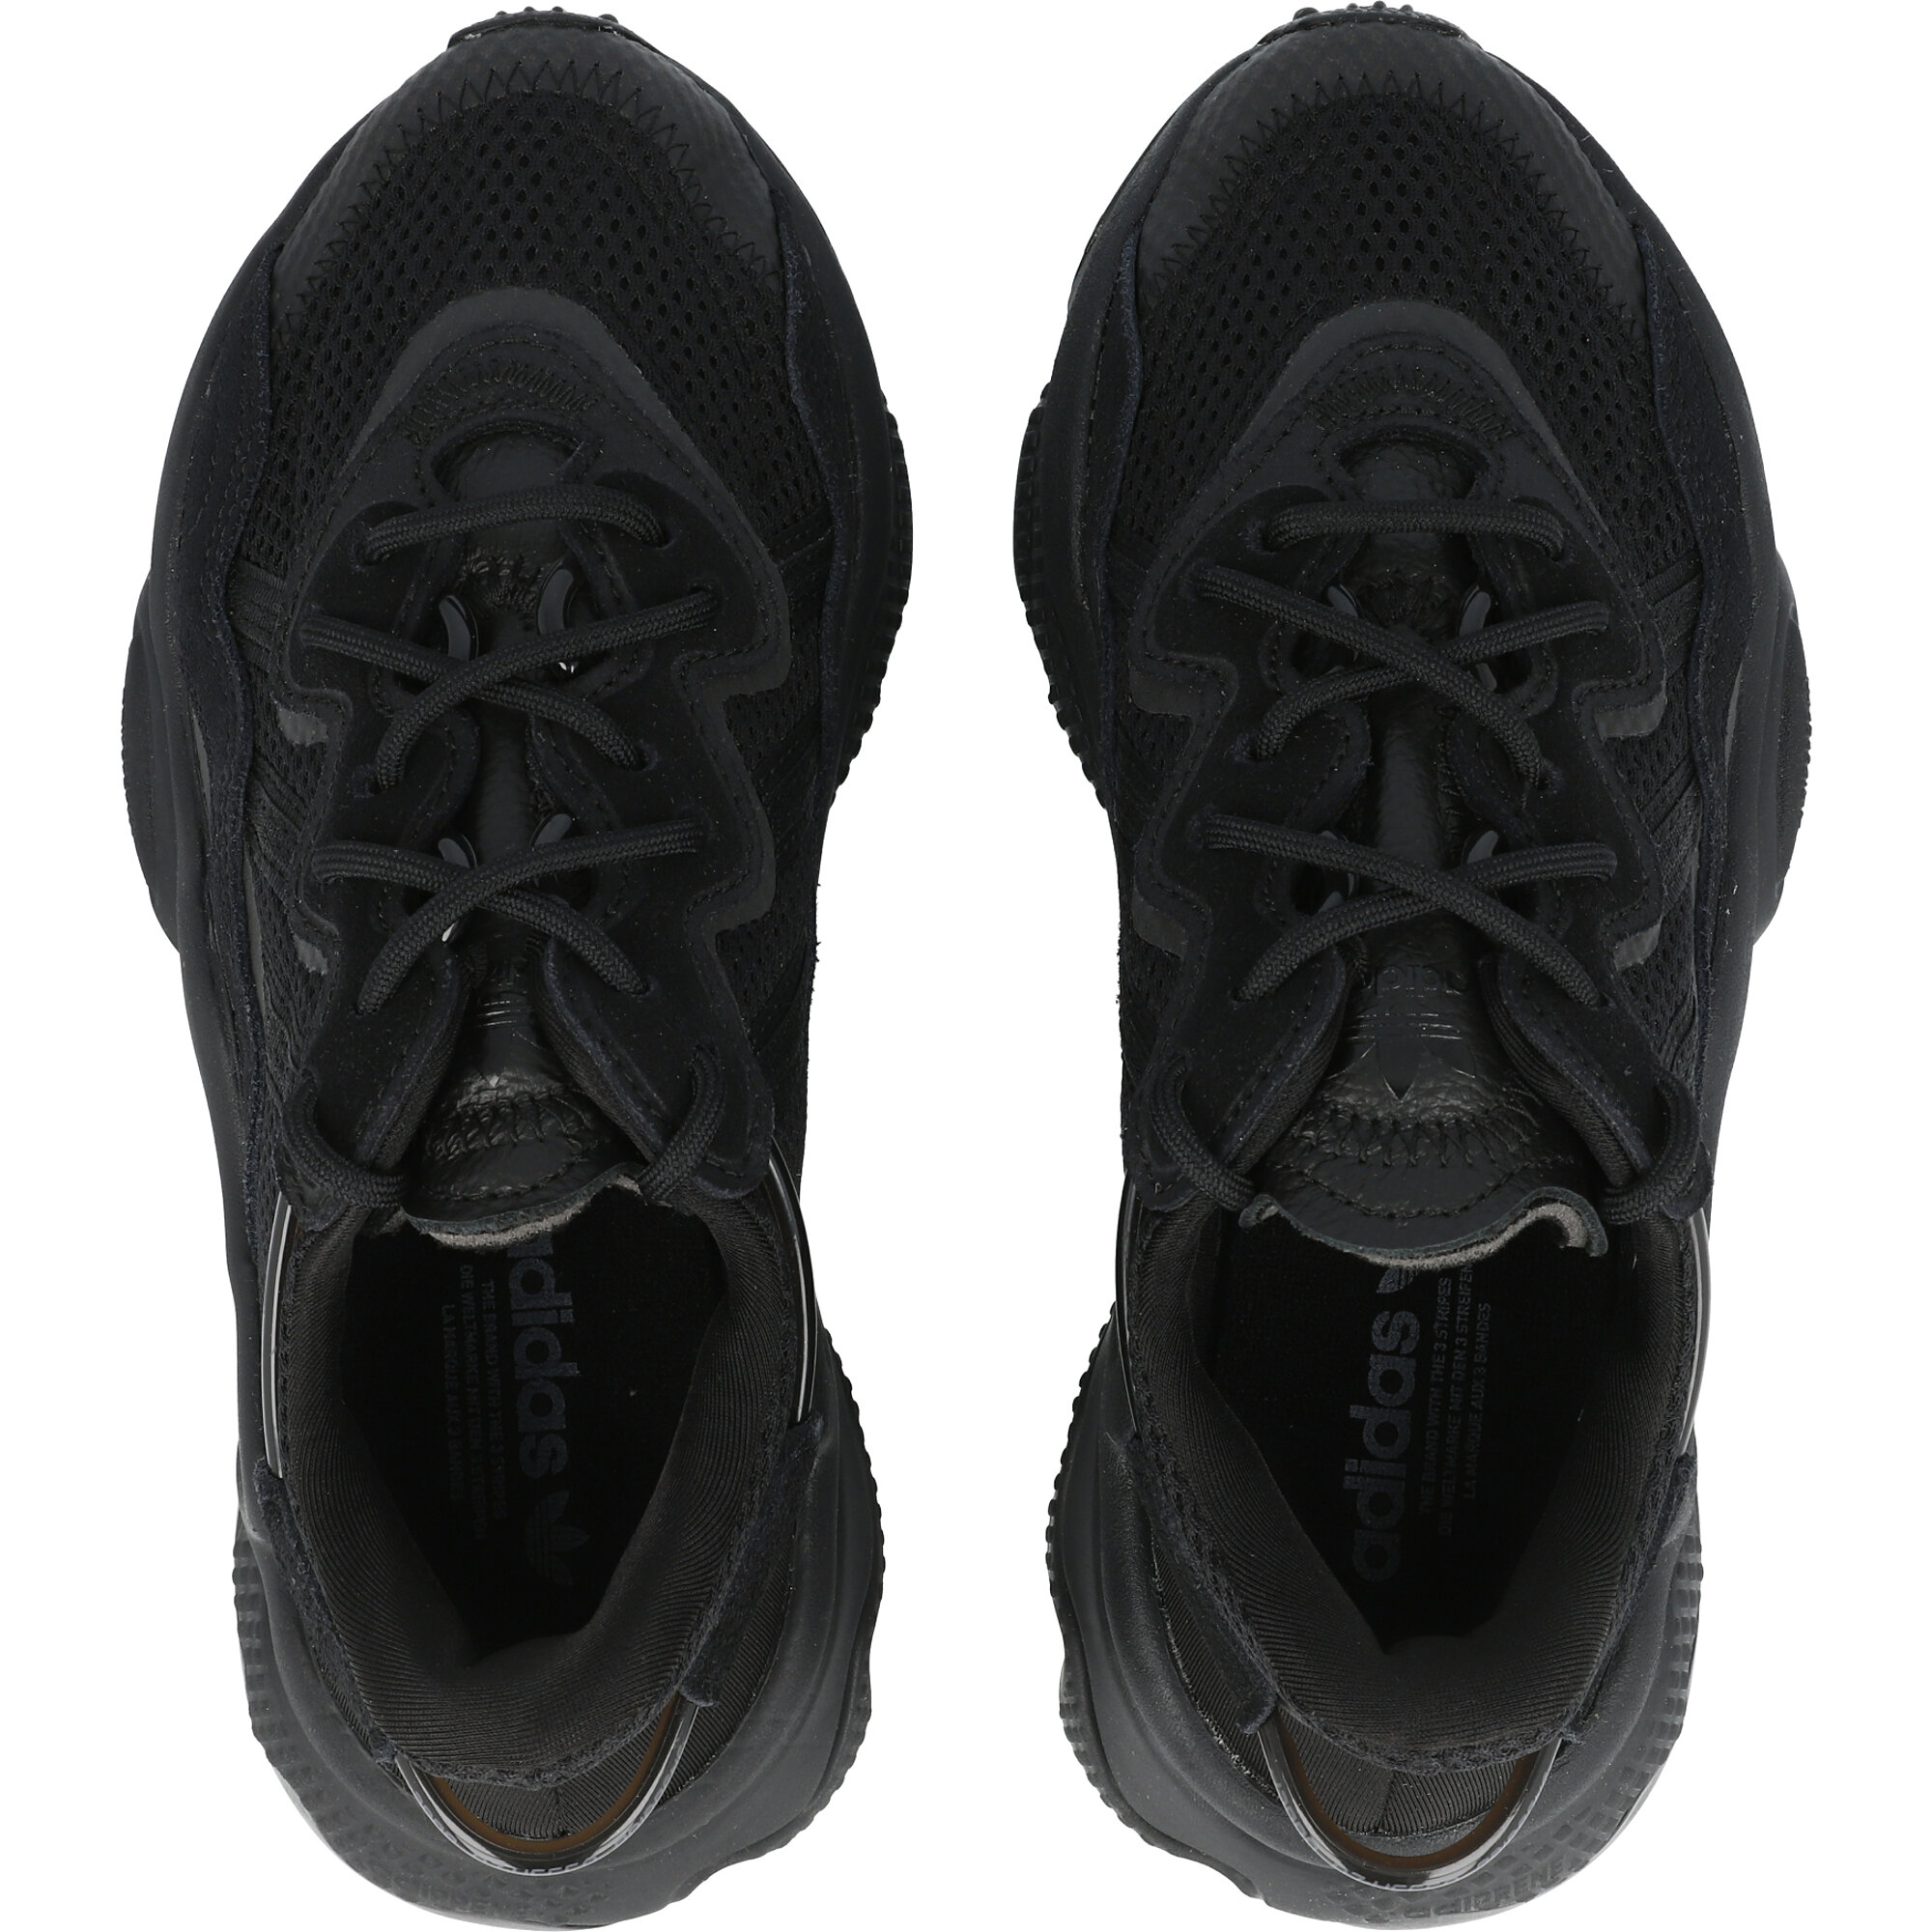 adidas Originals Ozweego J Core Black/Trace Grey Metallic Textile Junior